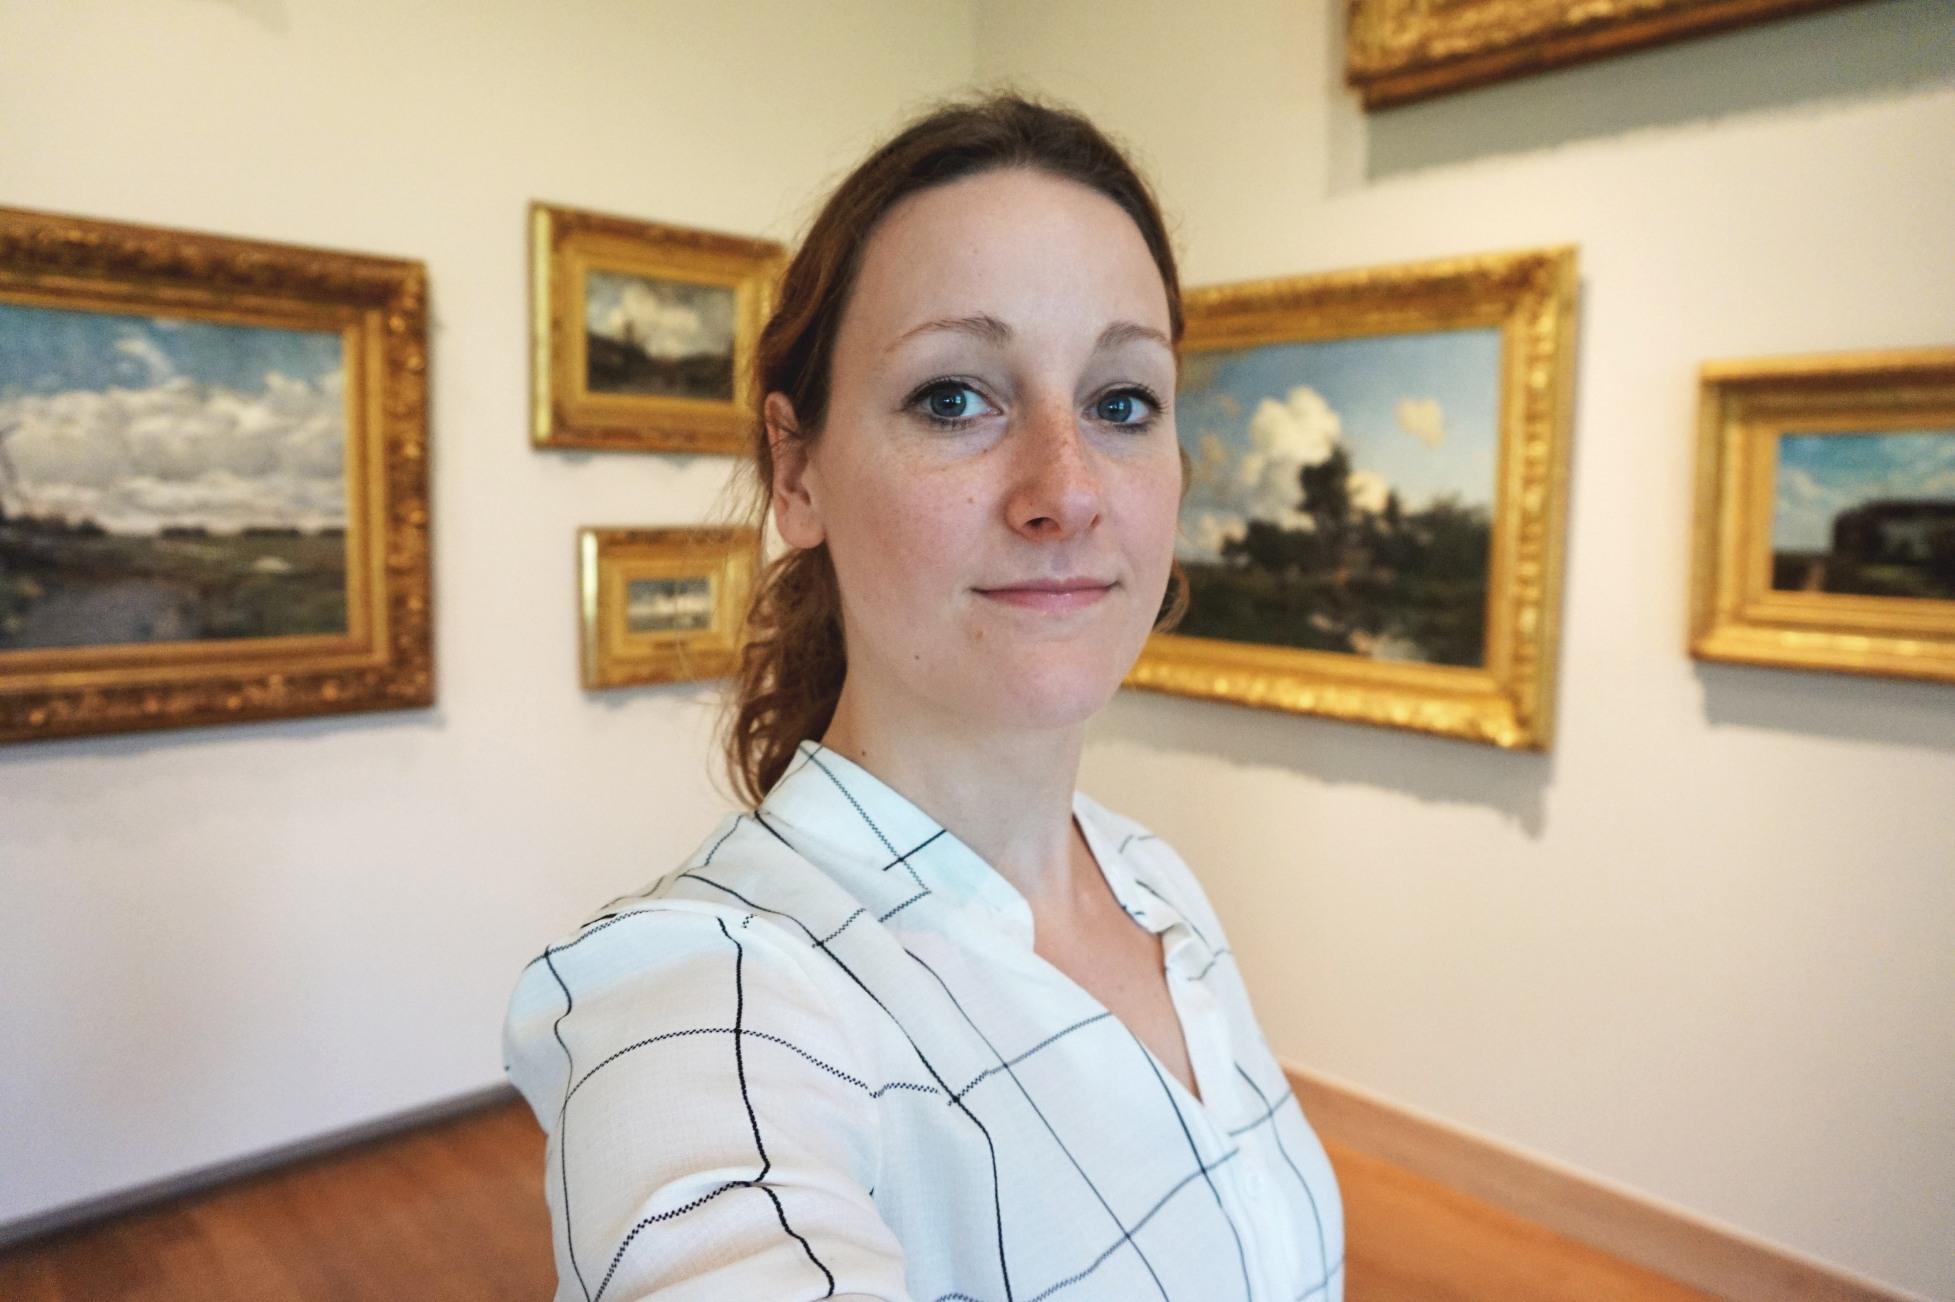 Yvette Museologue